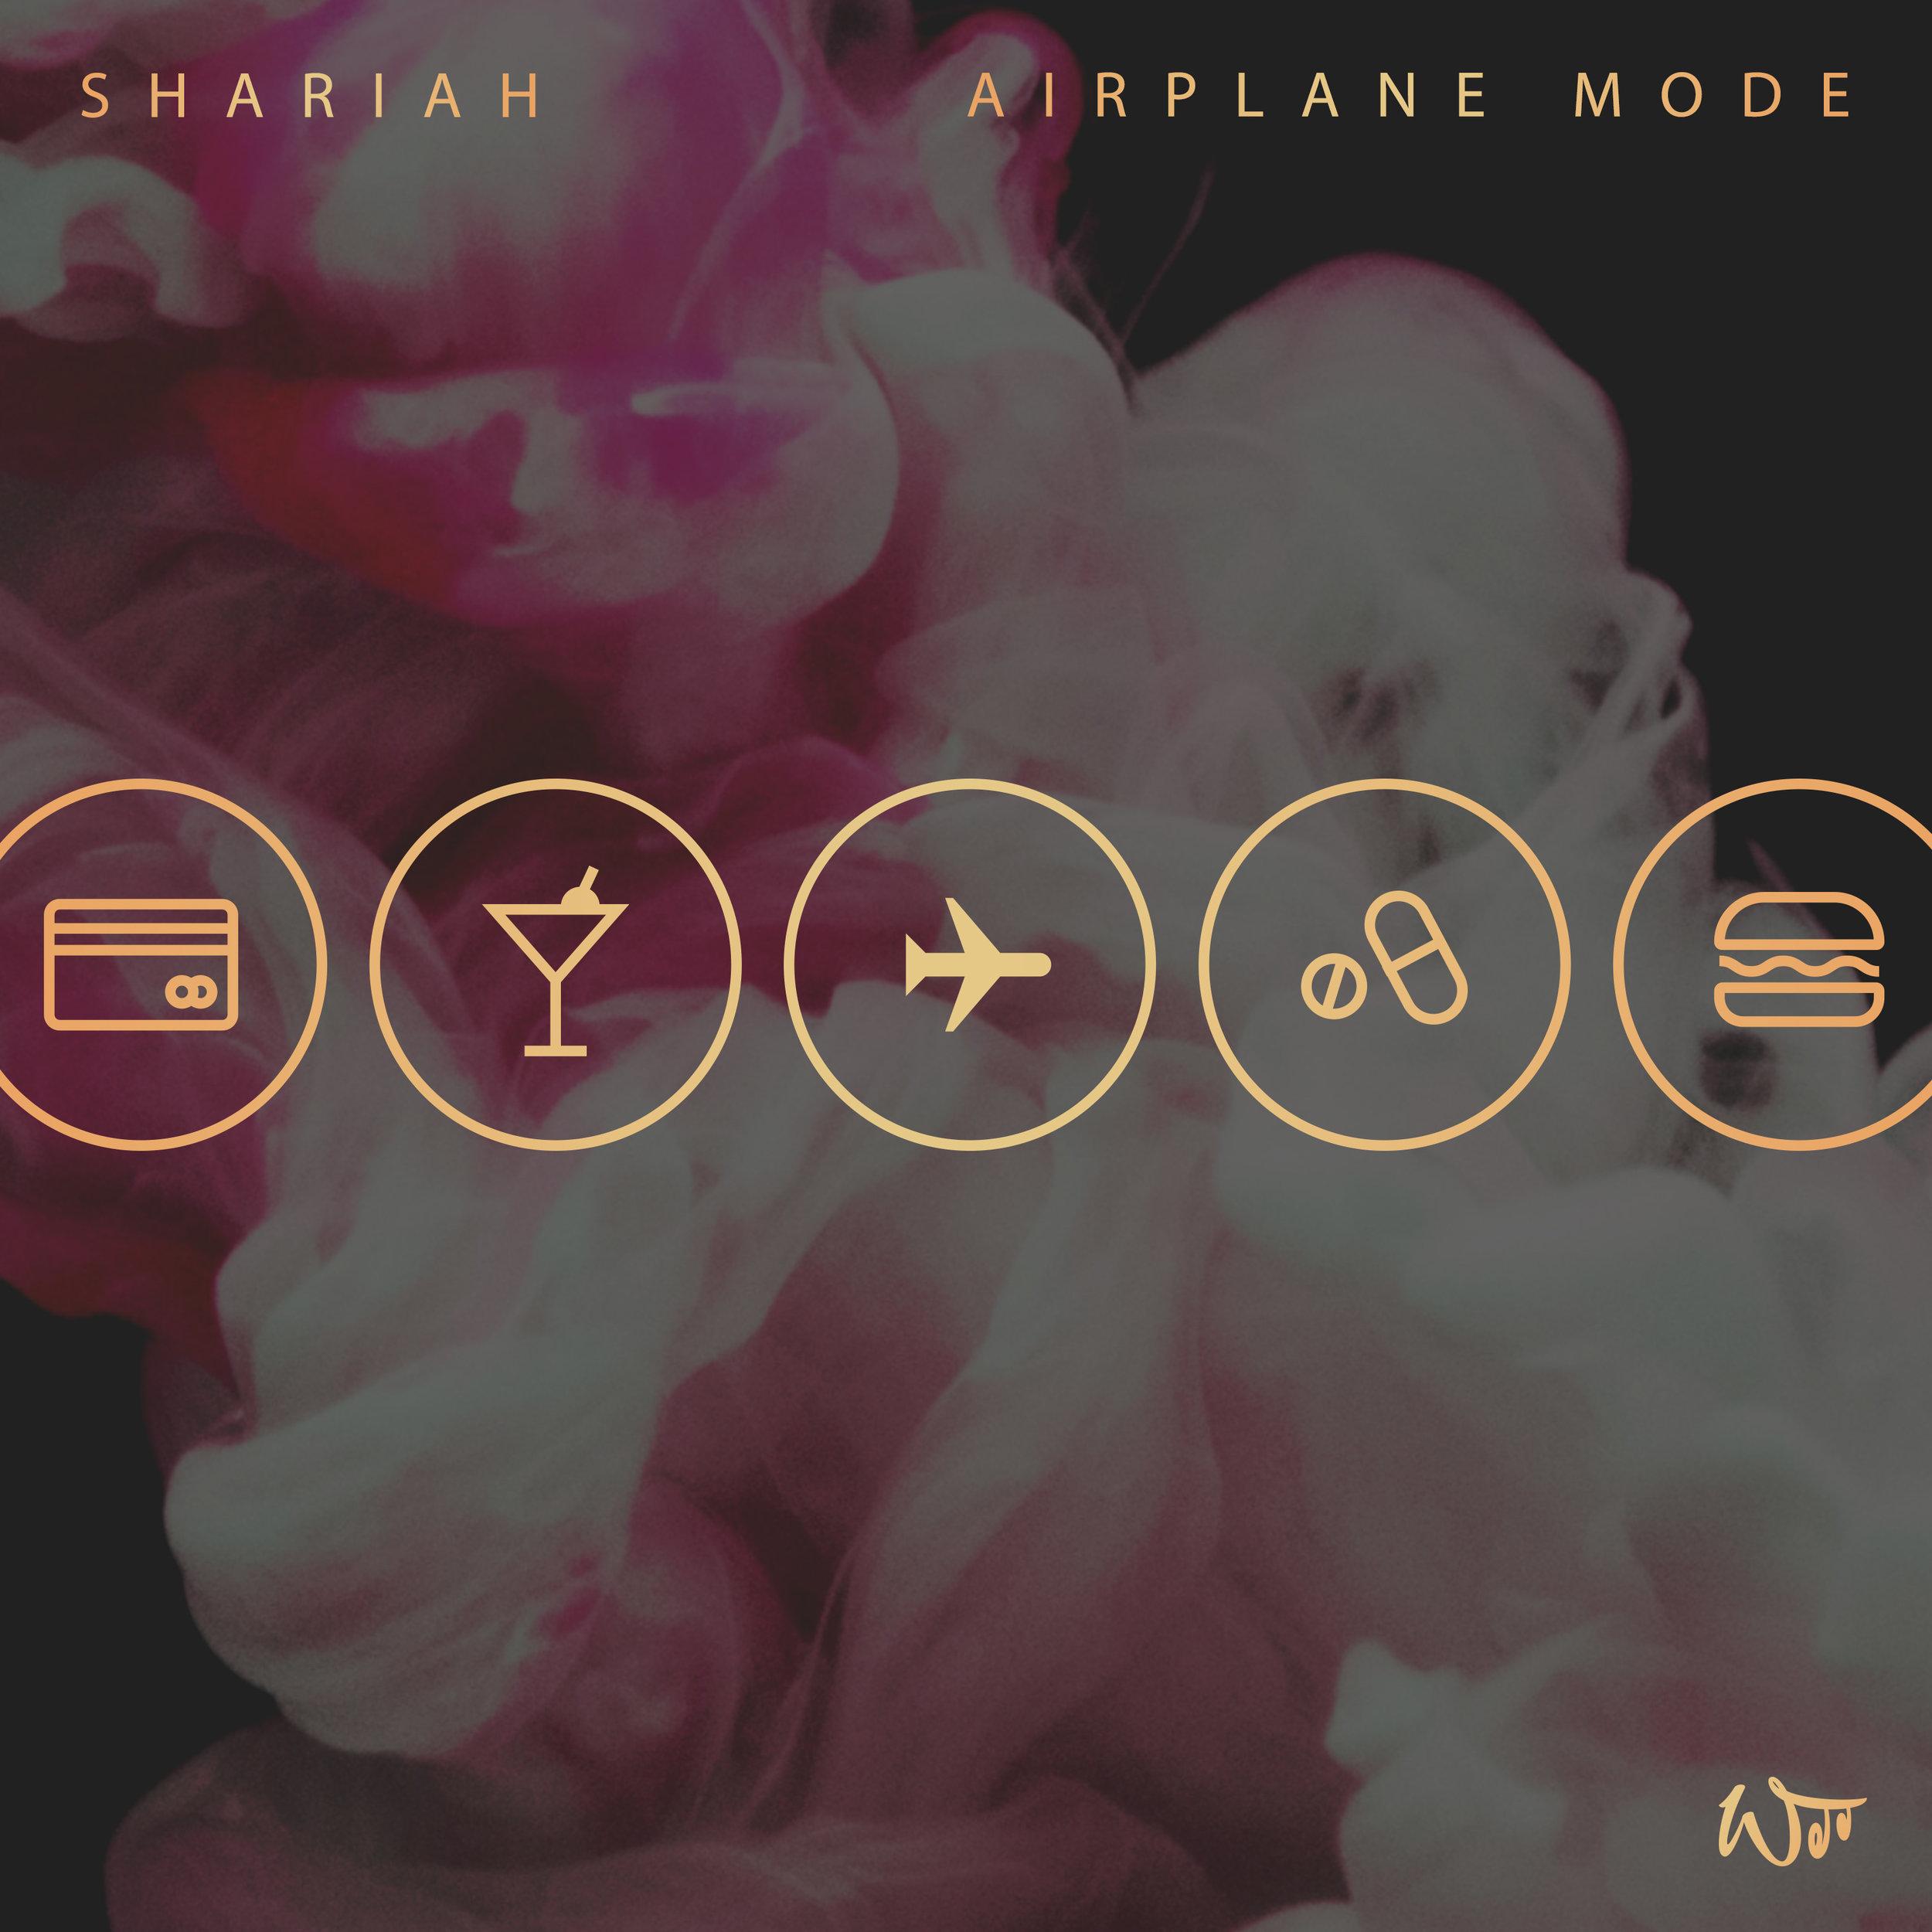 Airplane Mode 1 - itunes.jpg